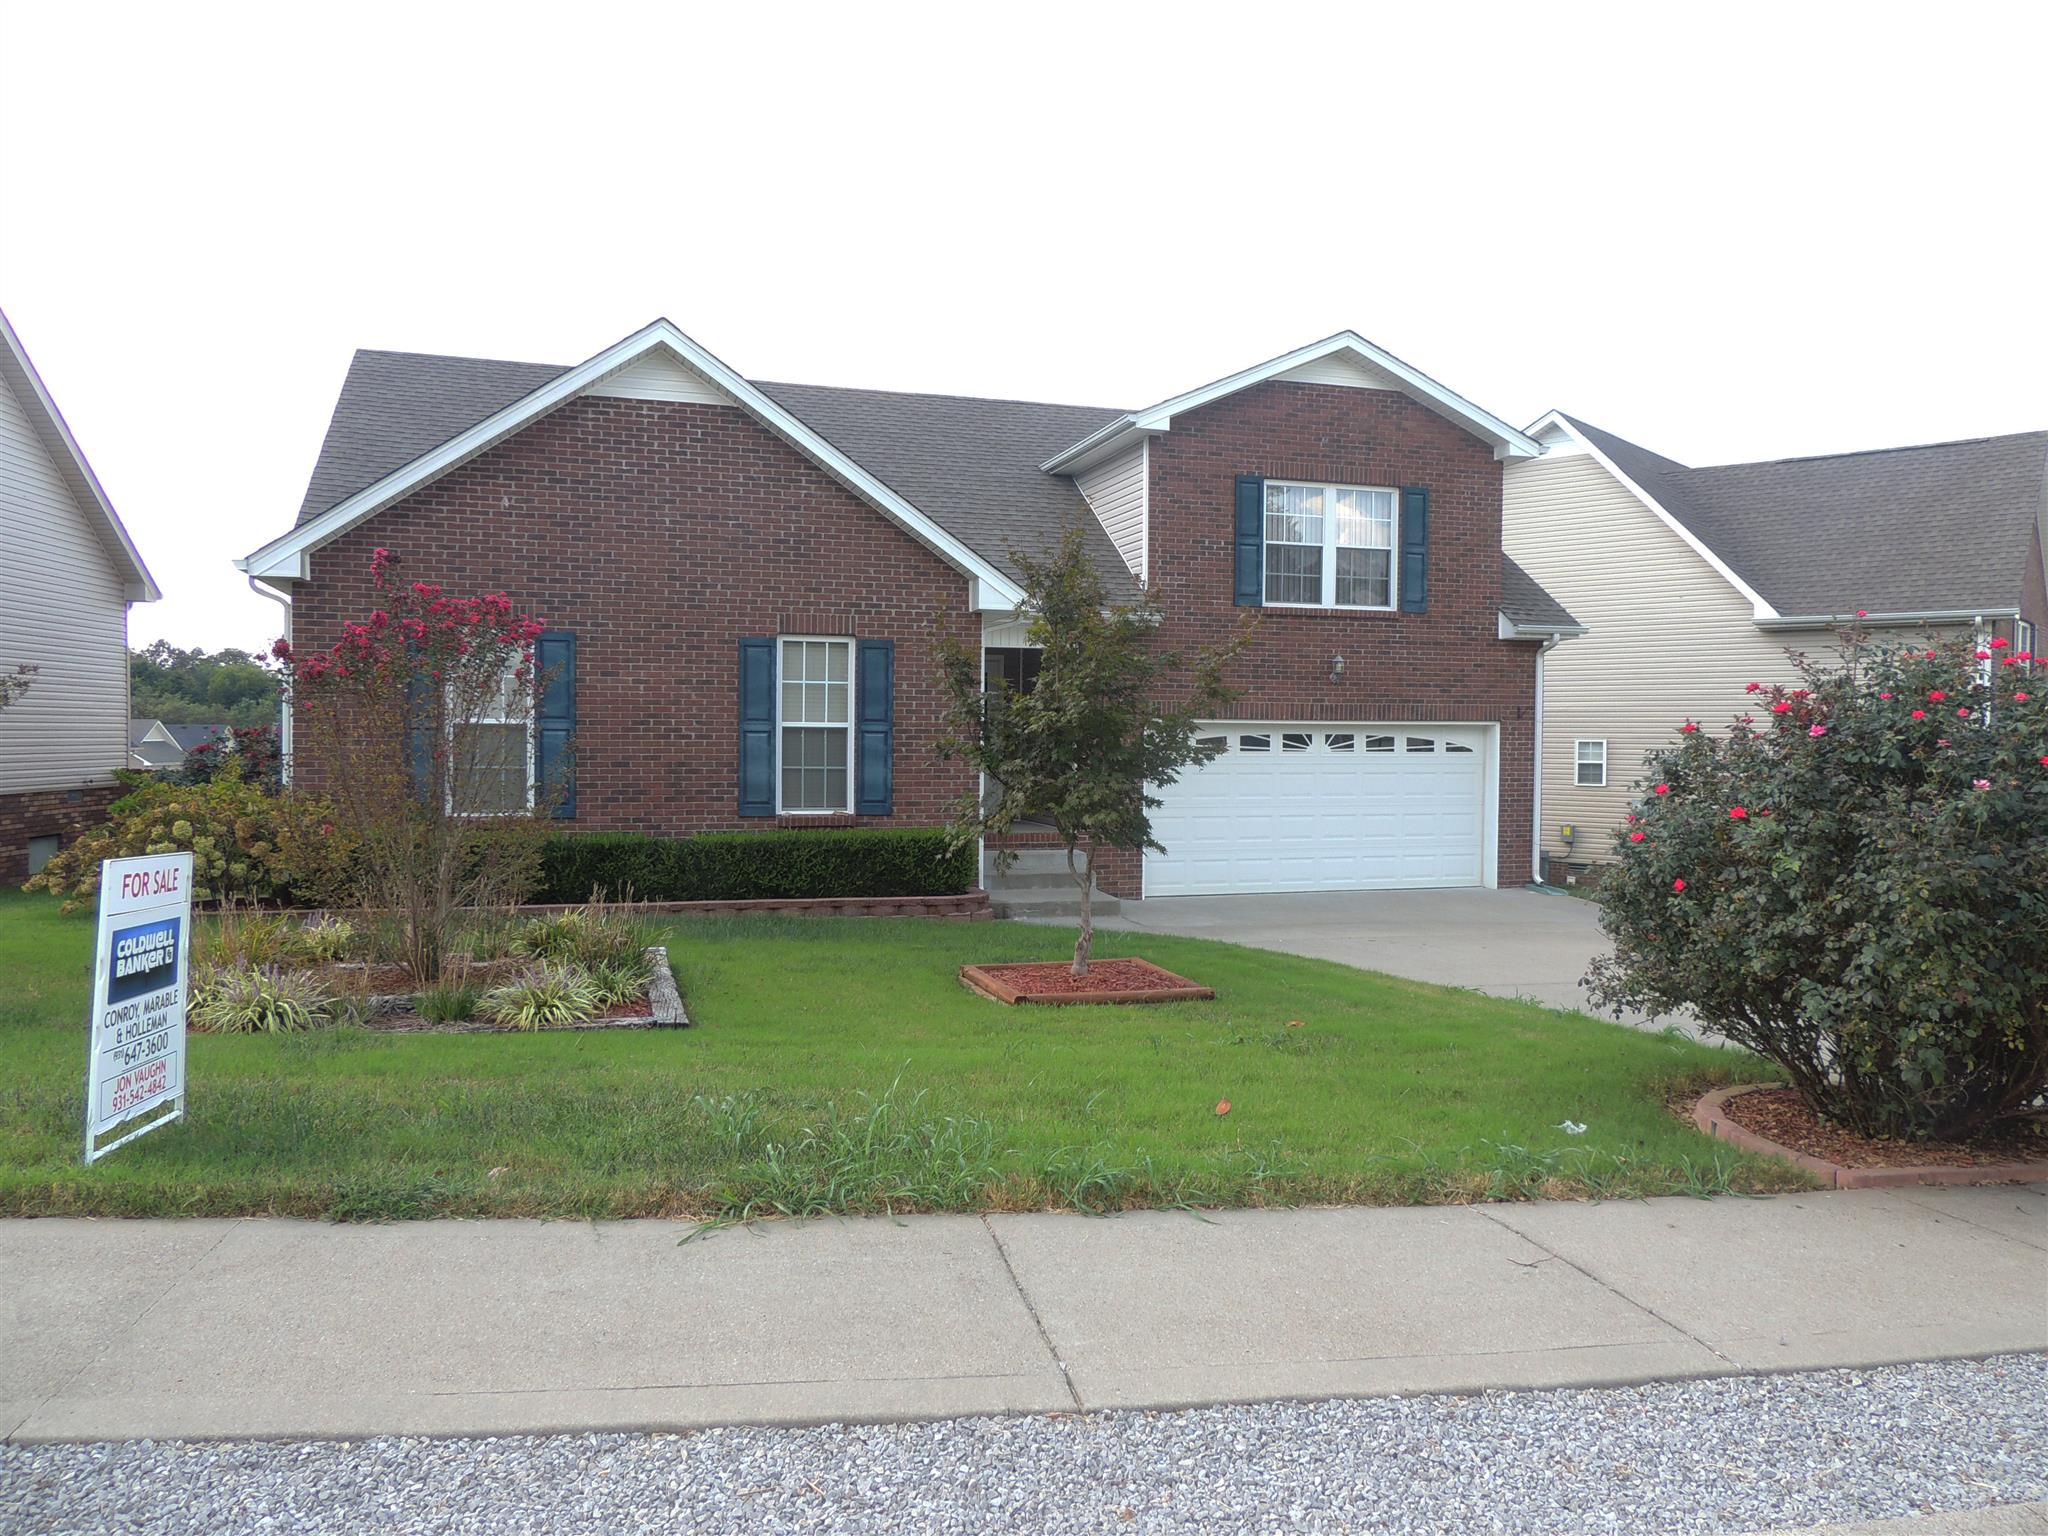 676 Foxfield Dr, Clarksville, TN 37042